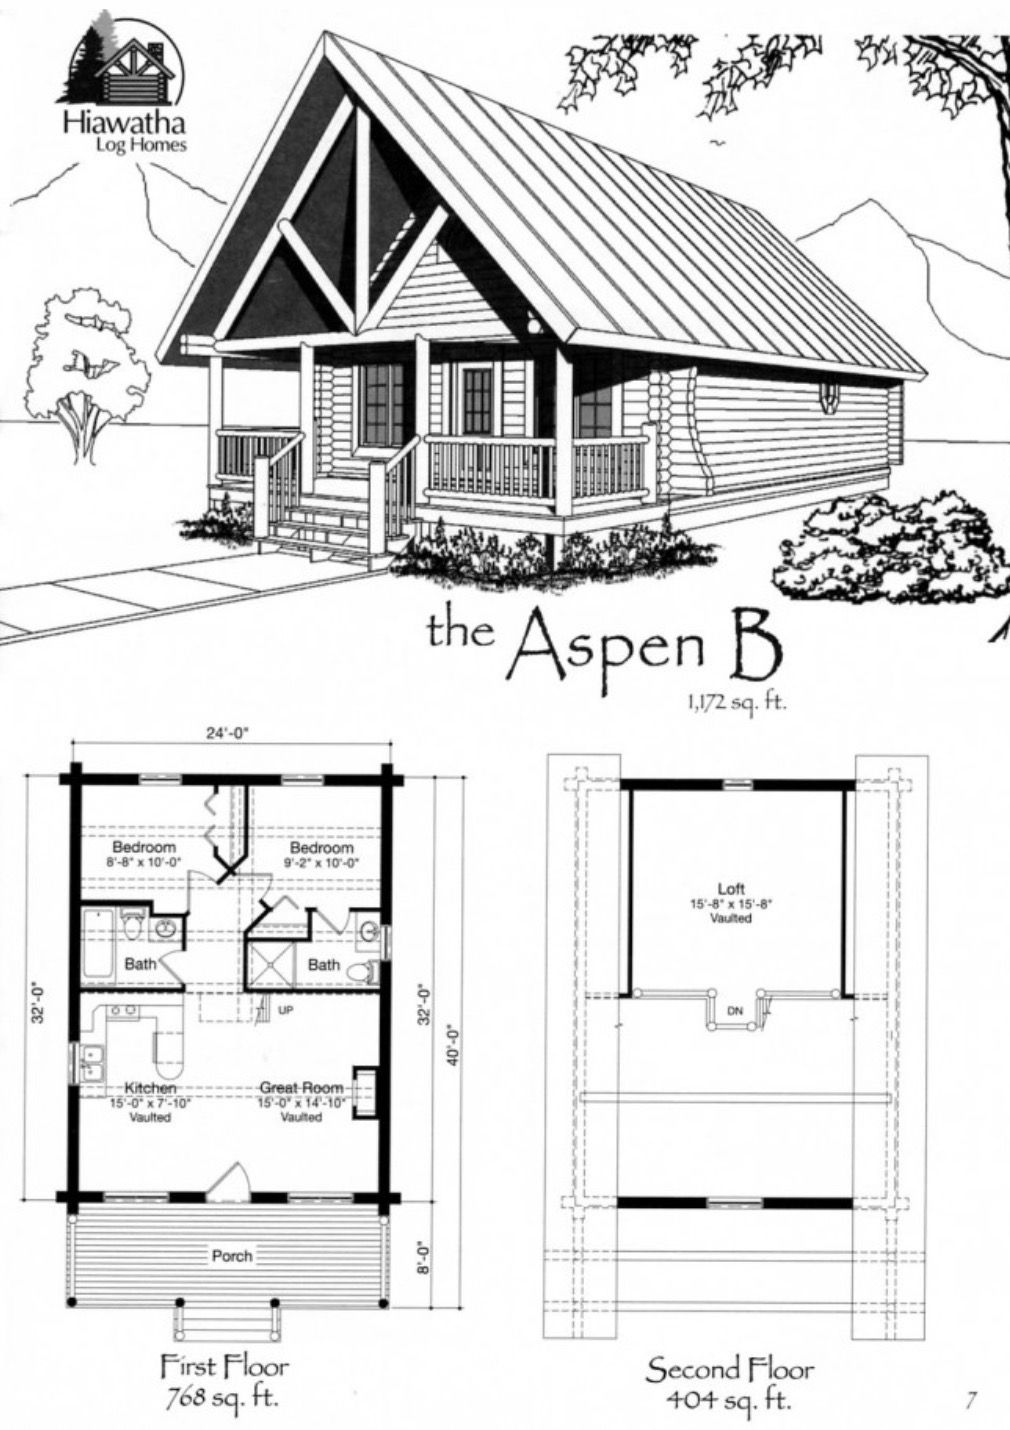 Aspen B Http Www Cityhomeconstructions House 2